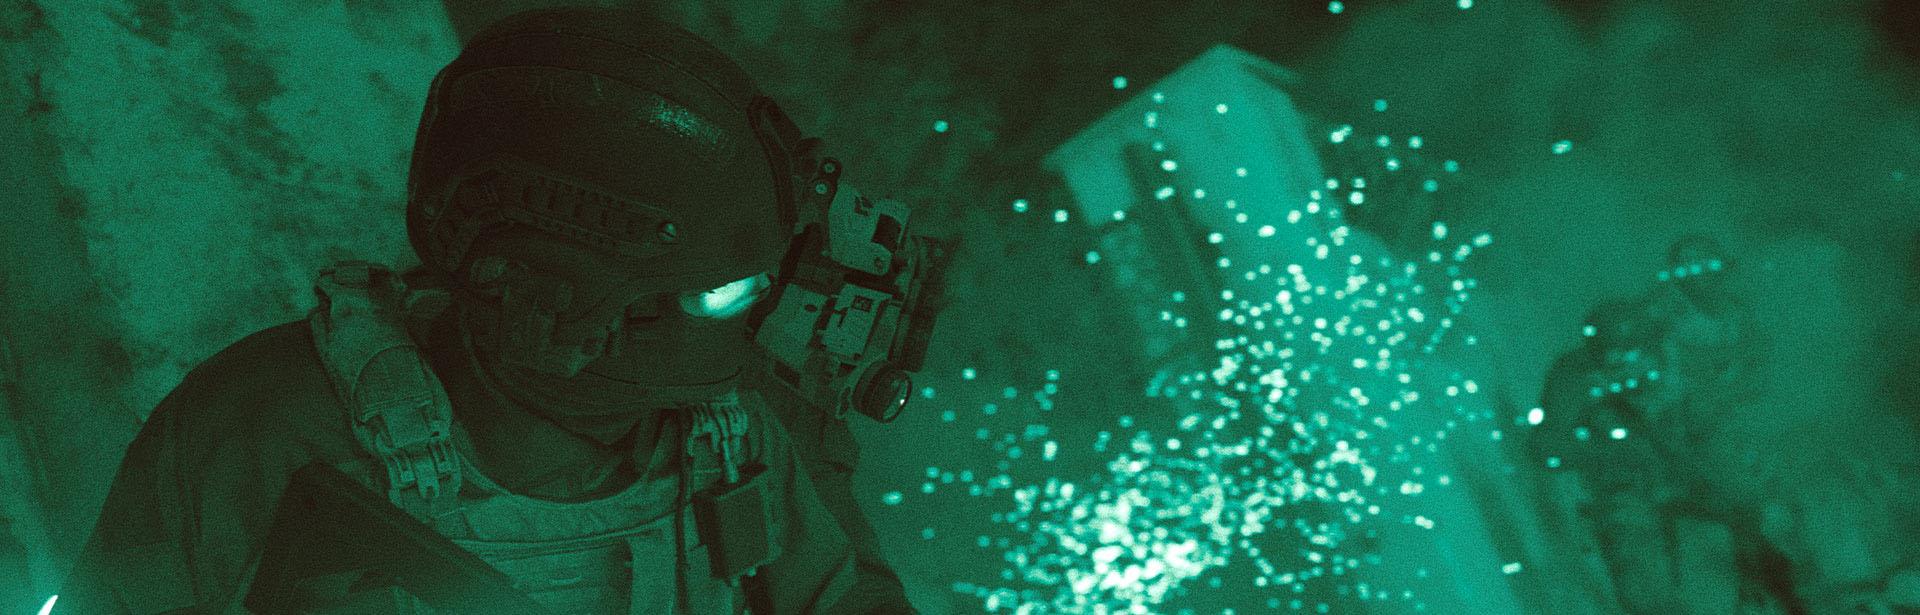 SCUF: Call of Duty®: Modern Warfare® Game Guide header